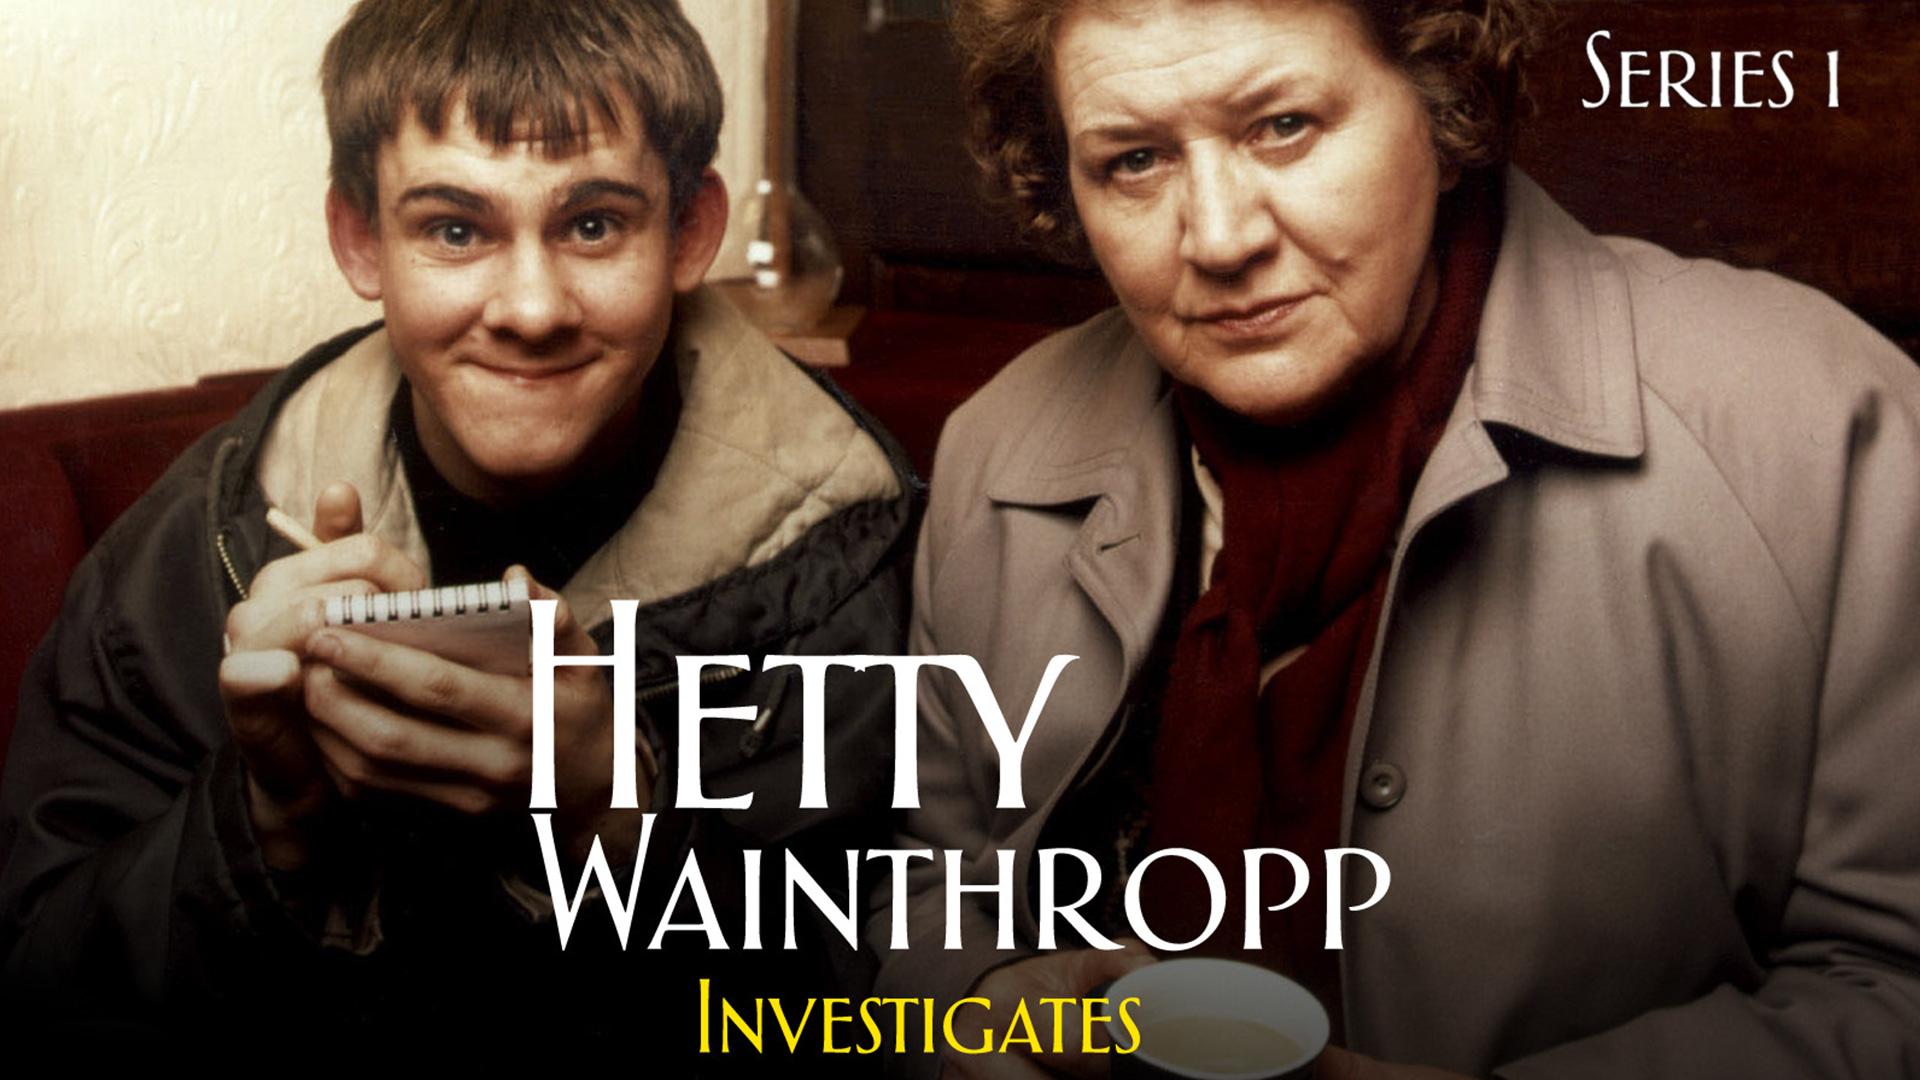 Hetty Wainthropp Investigates, Season 1